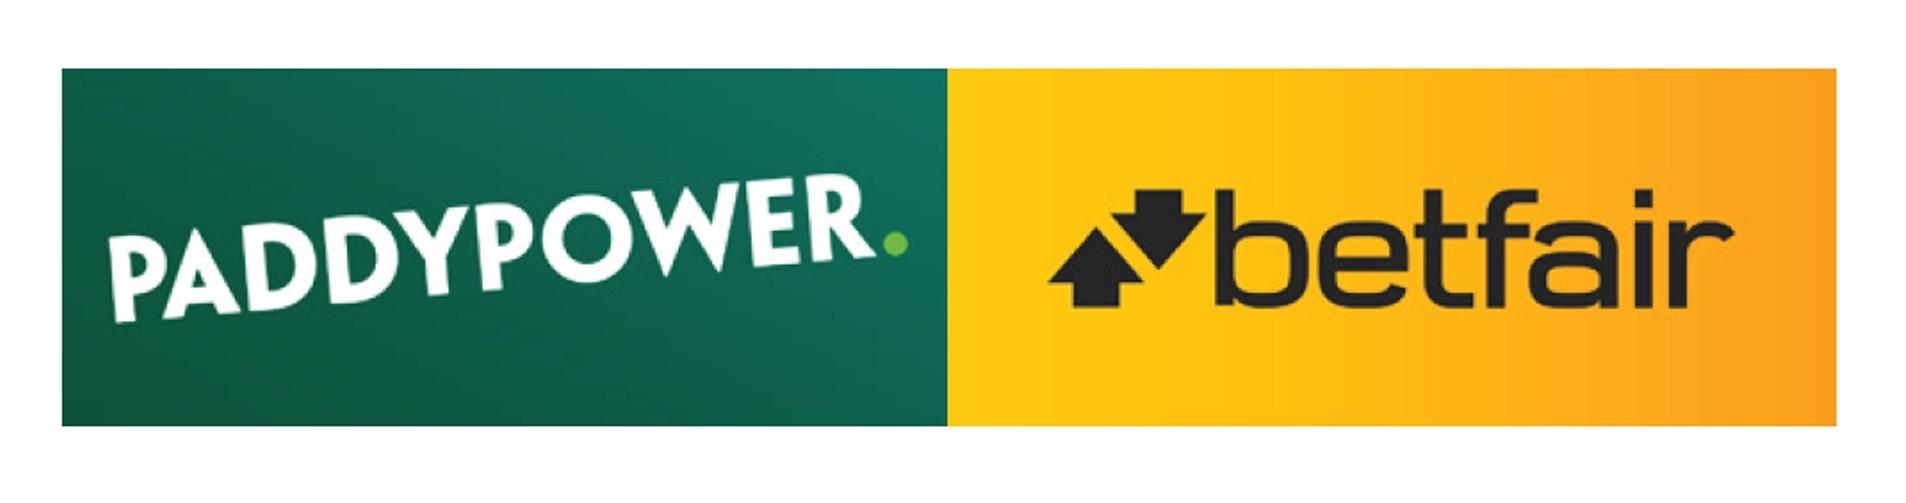 paddy power betfair image